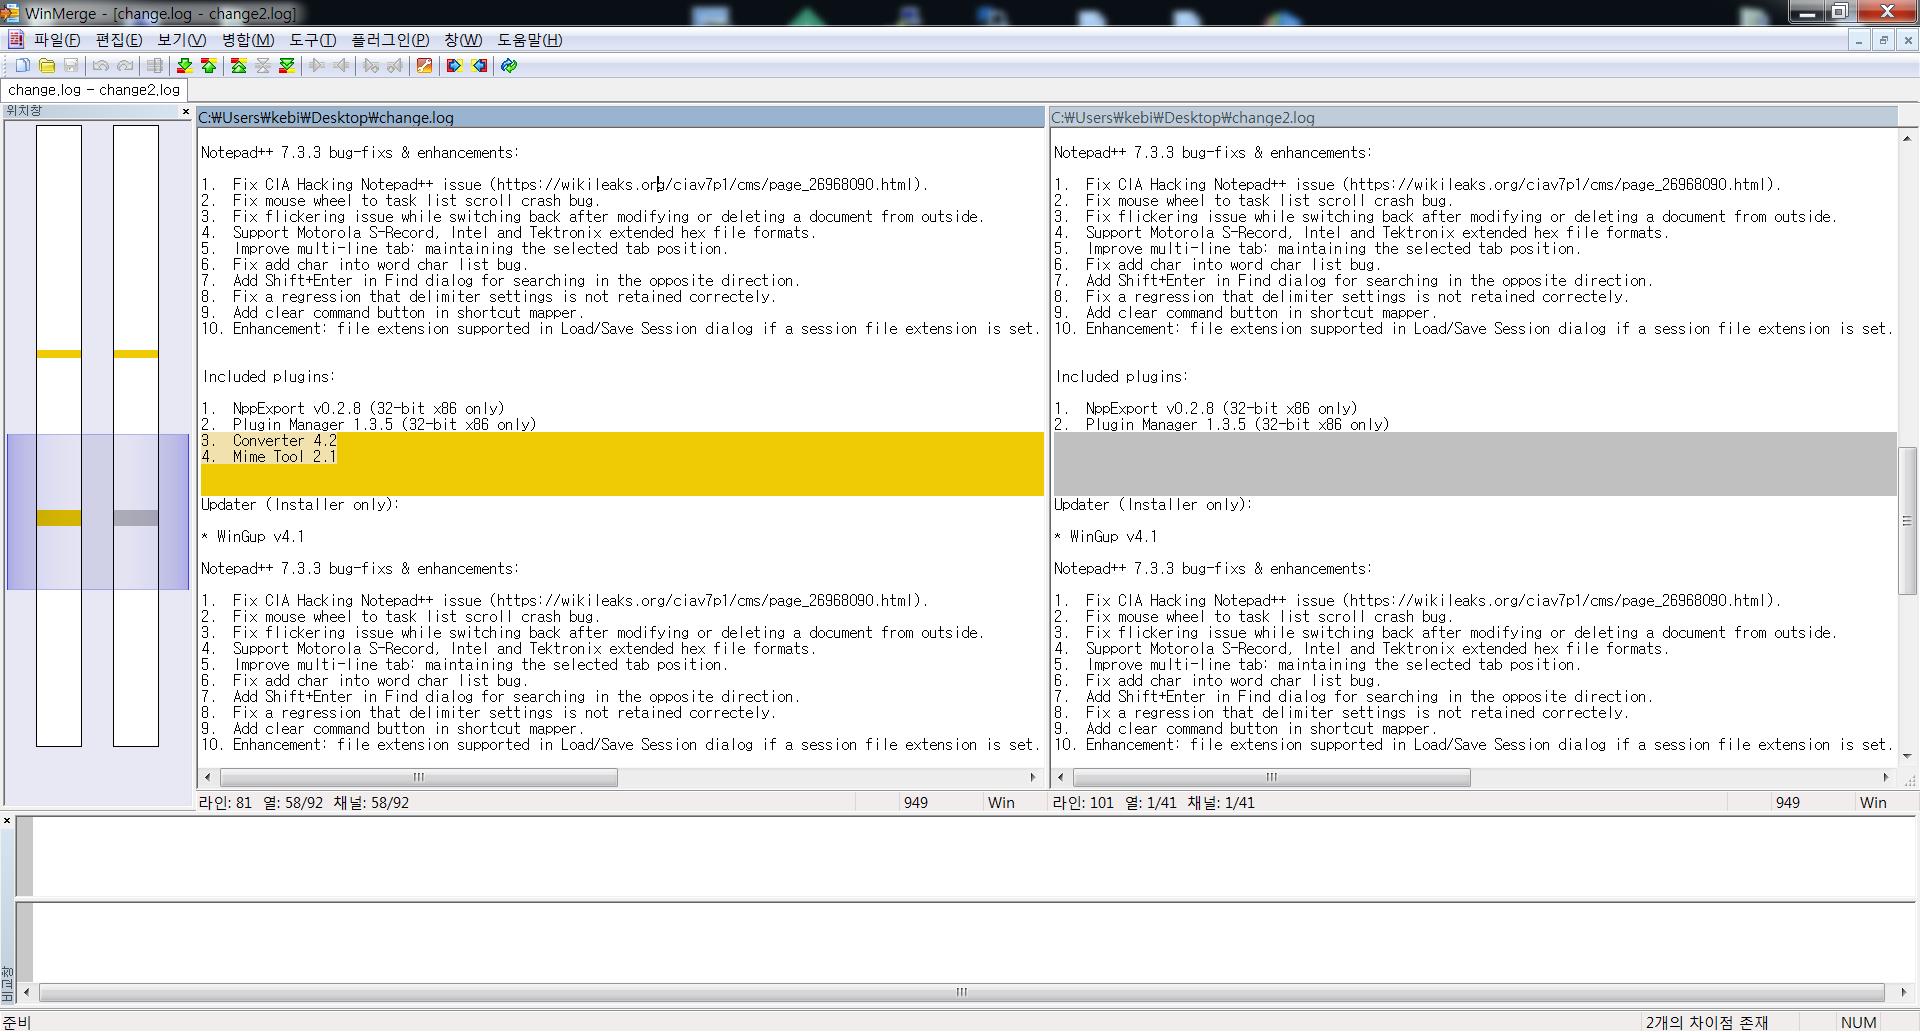 WinMerge 문서 비교 프로그램